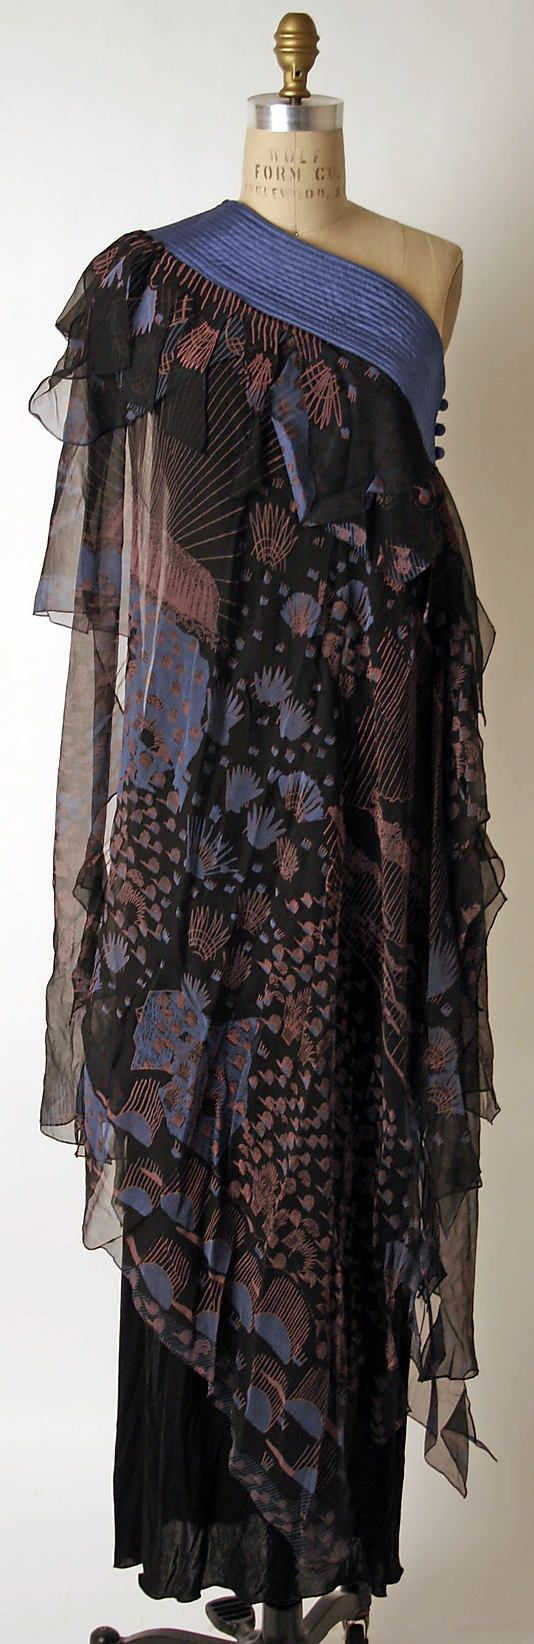 1974 Zandra Rhodes Evening dress Metropolitan Museum of Art, NY See more museum vintage dresses at http://www.vintagefashionandart.com/dresses